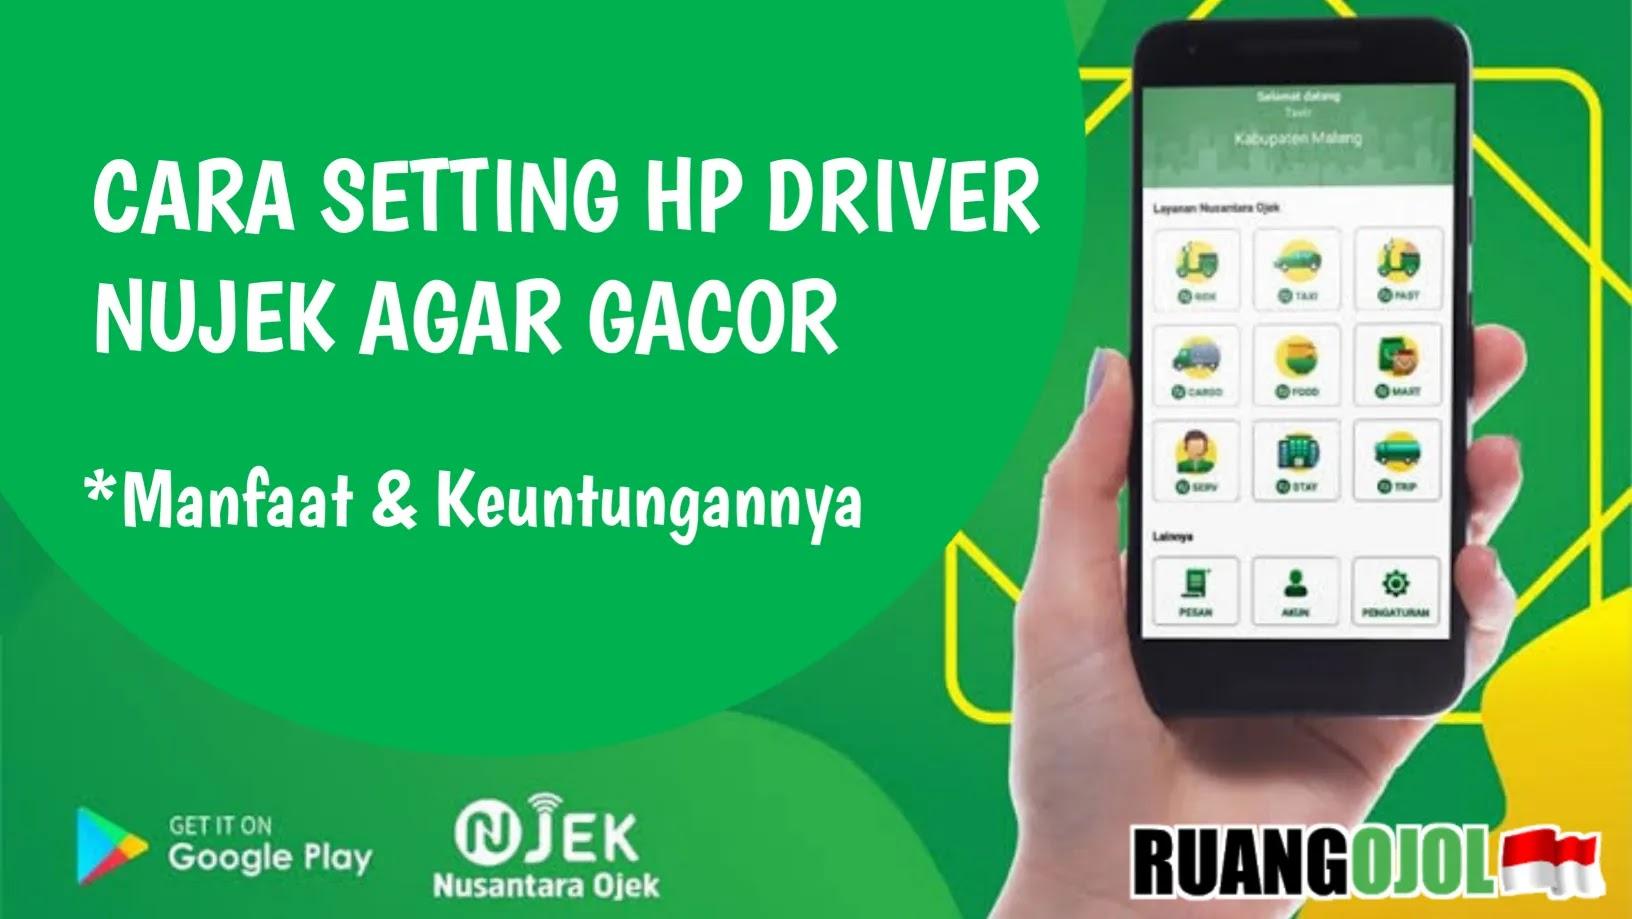 Cara Setting Hp Driver Nujek Agar Gacor Terbaru